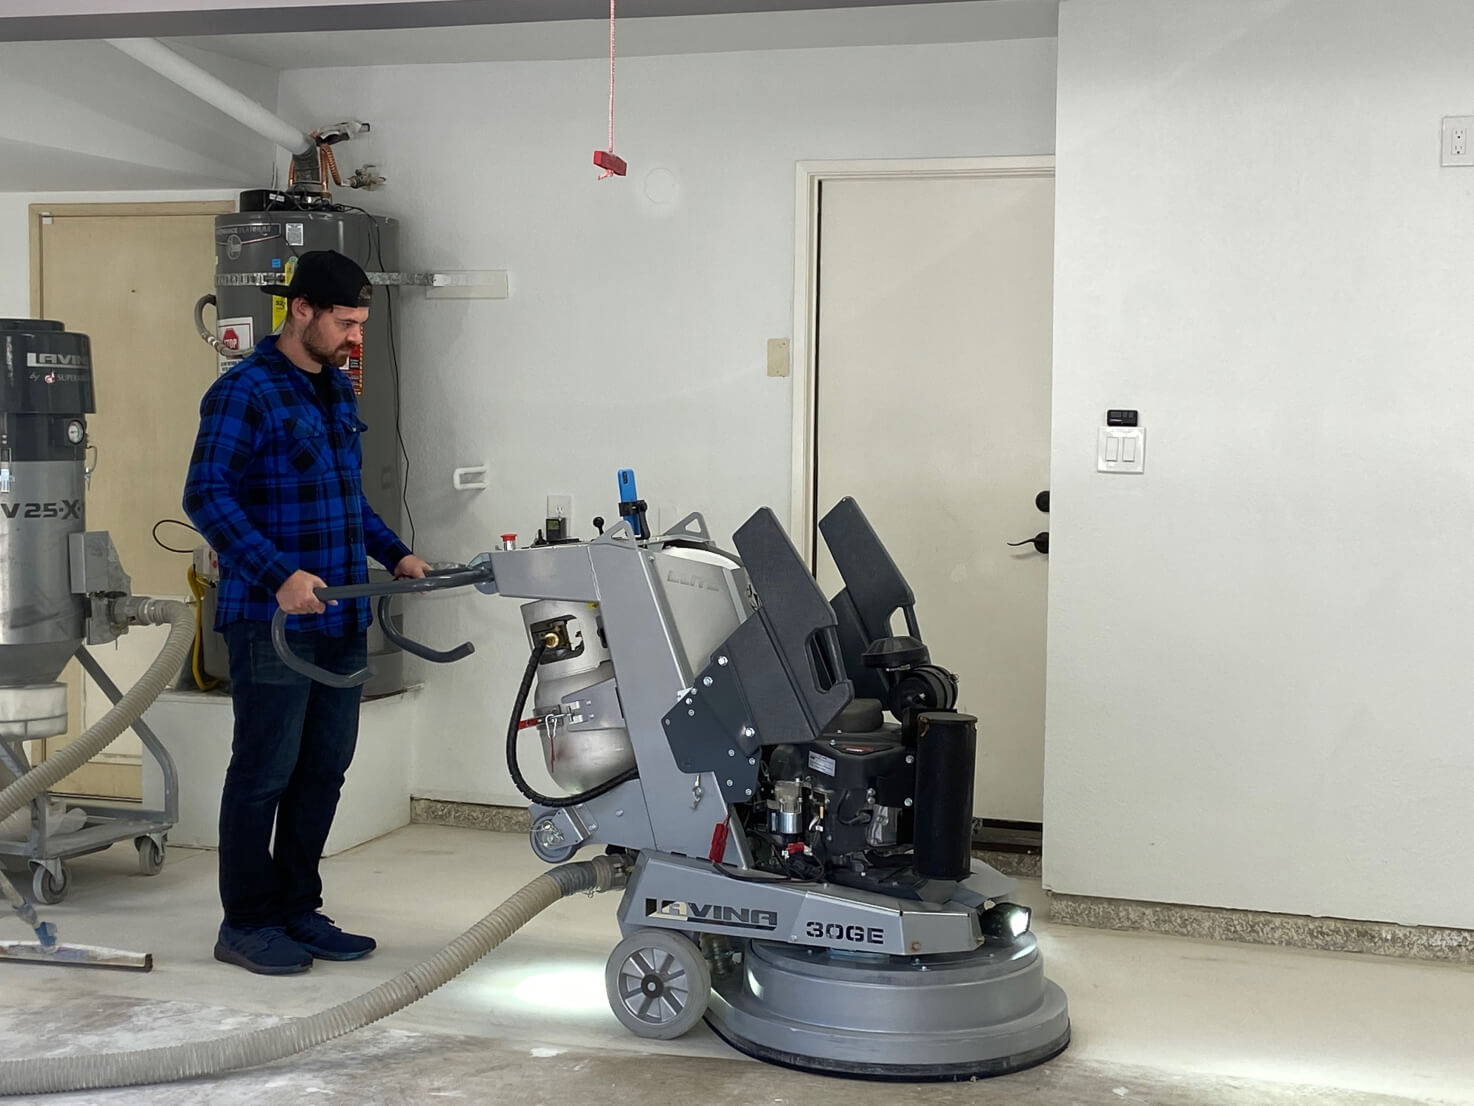 Evan Beckerman helping to prep the garage floor for LATICRETE resinous coatings